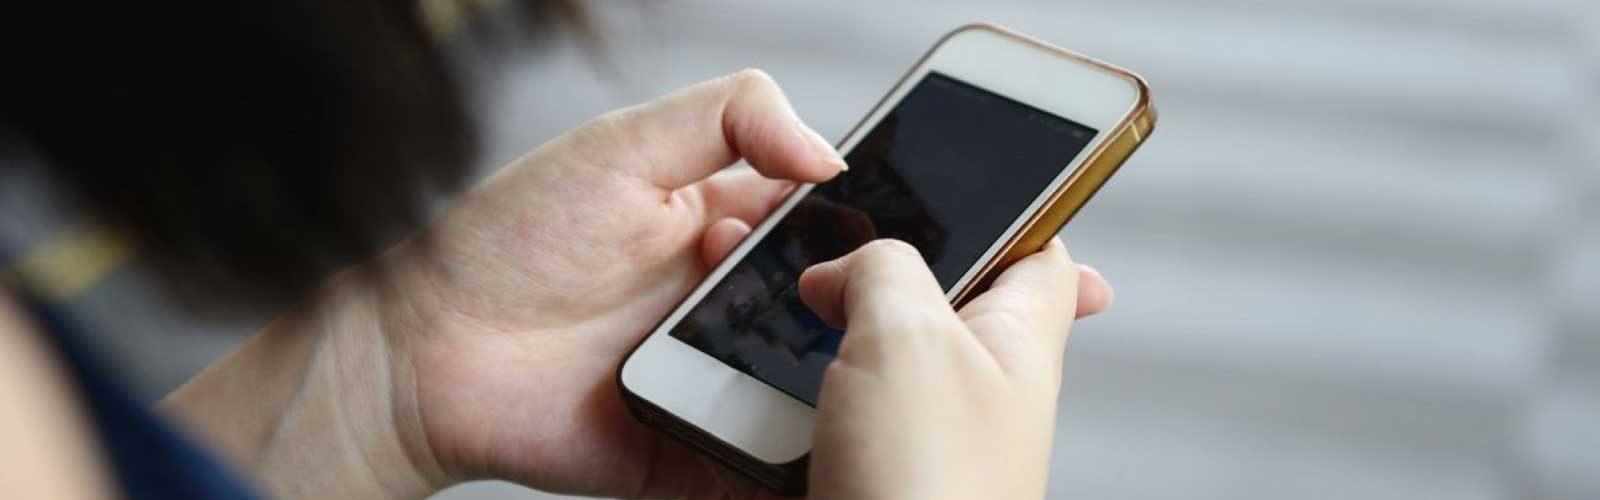 Earn Money on your Phone